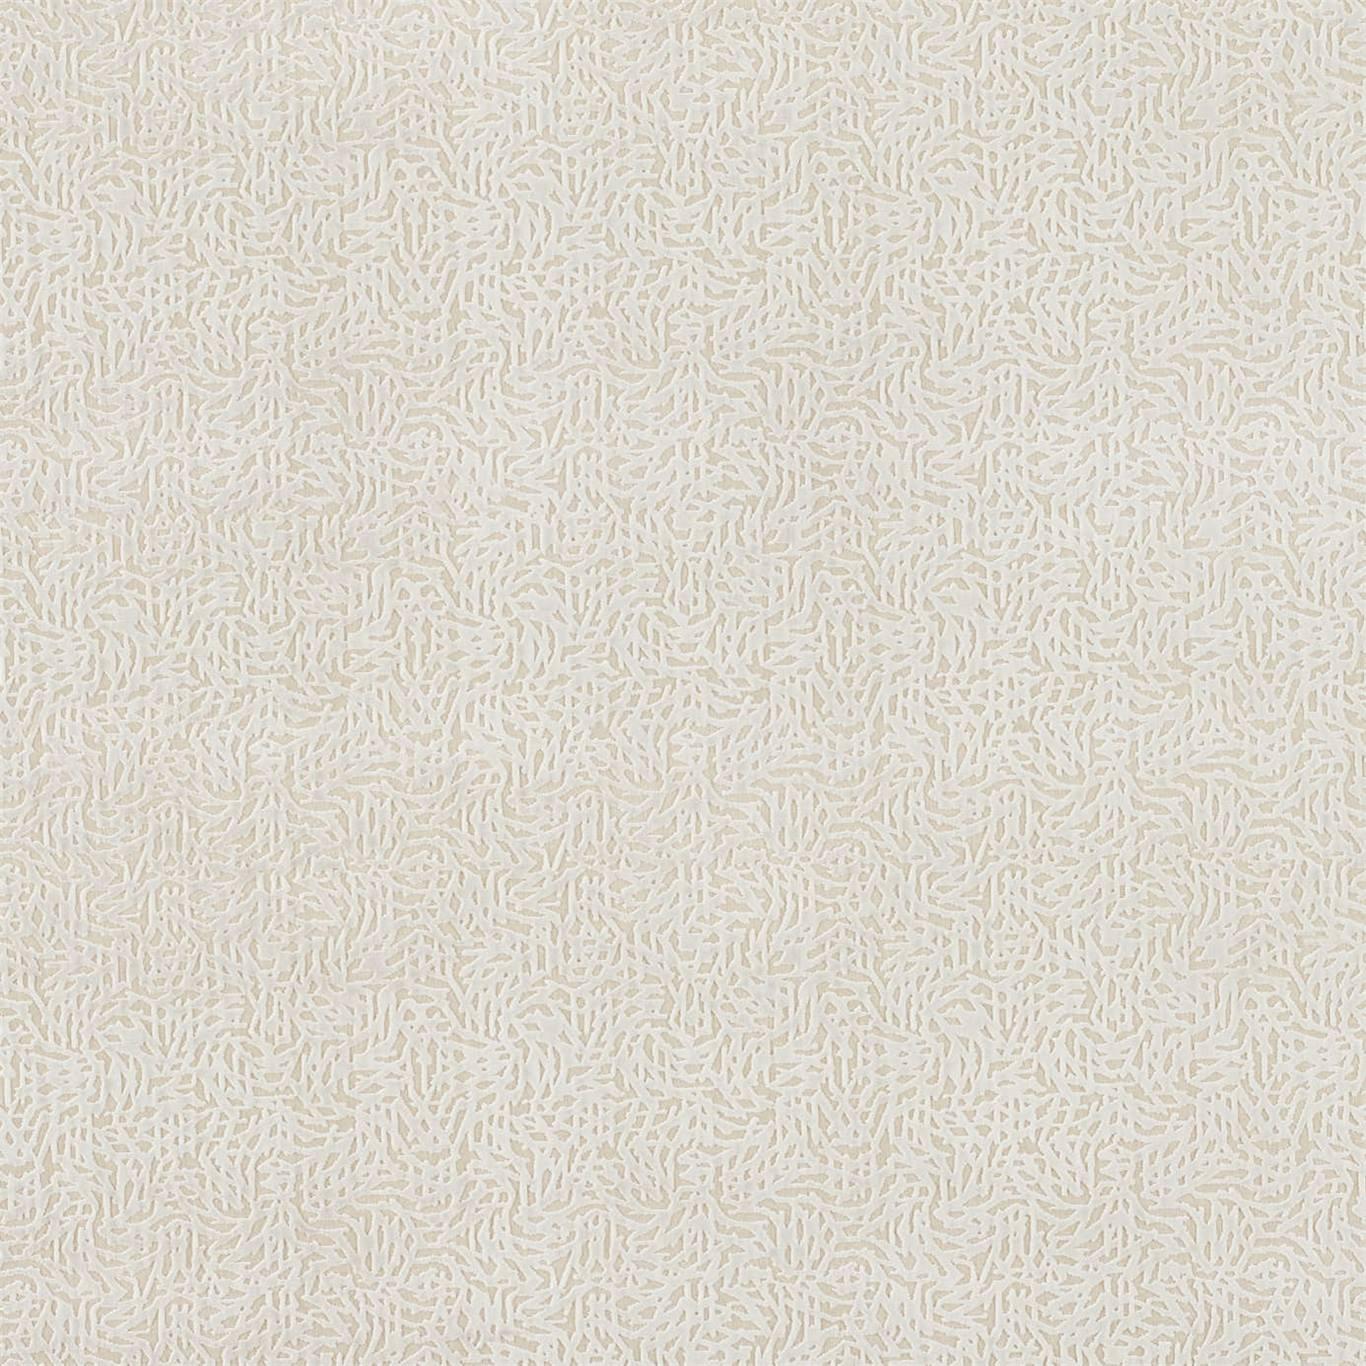 Image of Harlequin Dentella Silver Curtain Fabric 132679